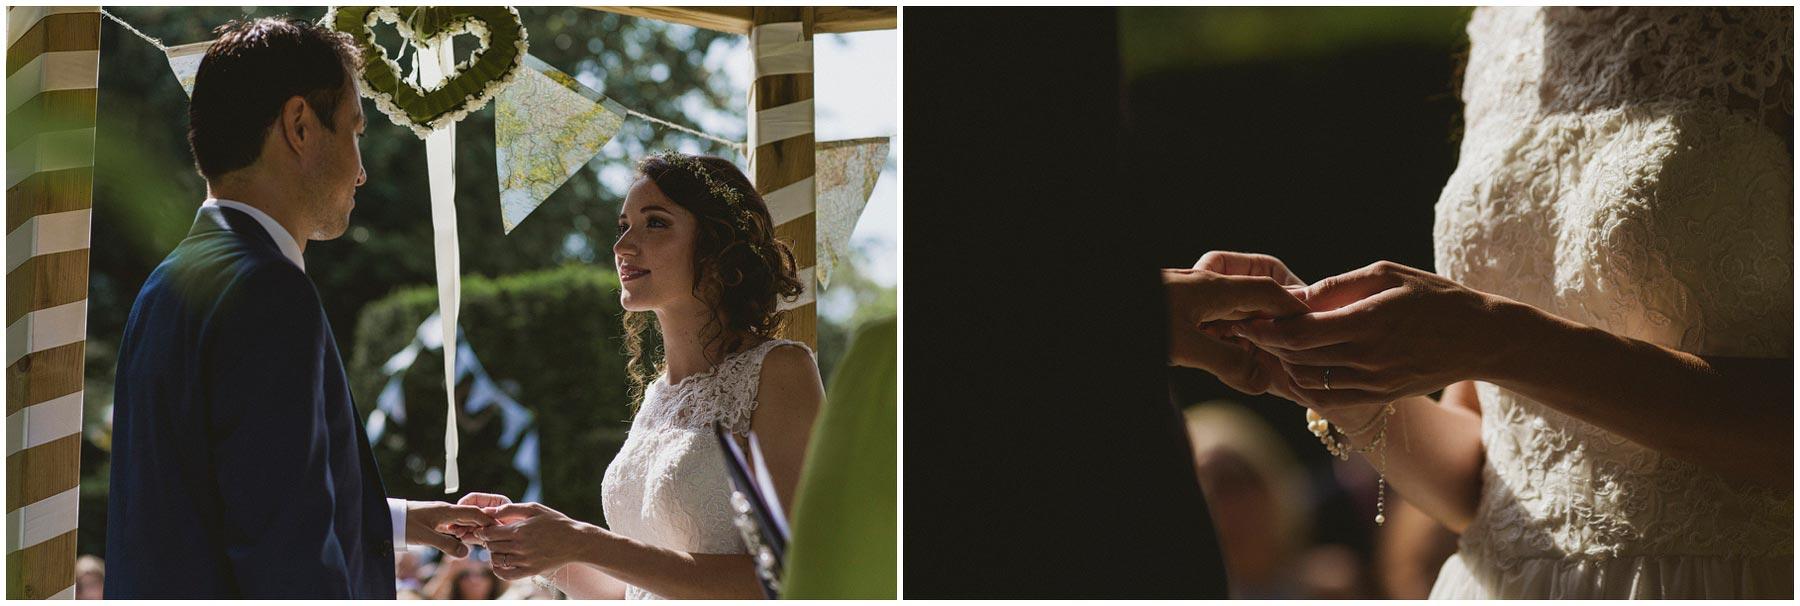 Colehayes-Park-Wedding-Photography_0081